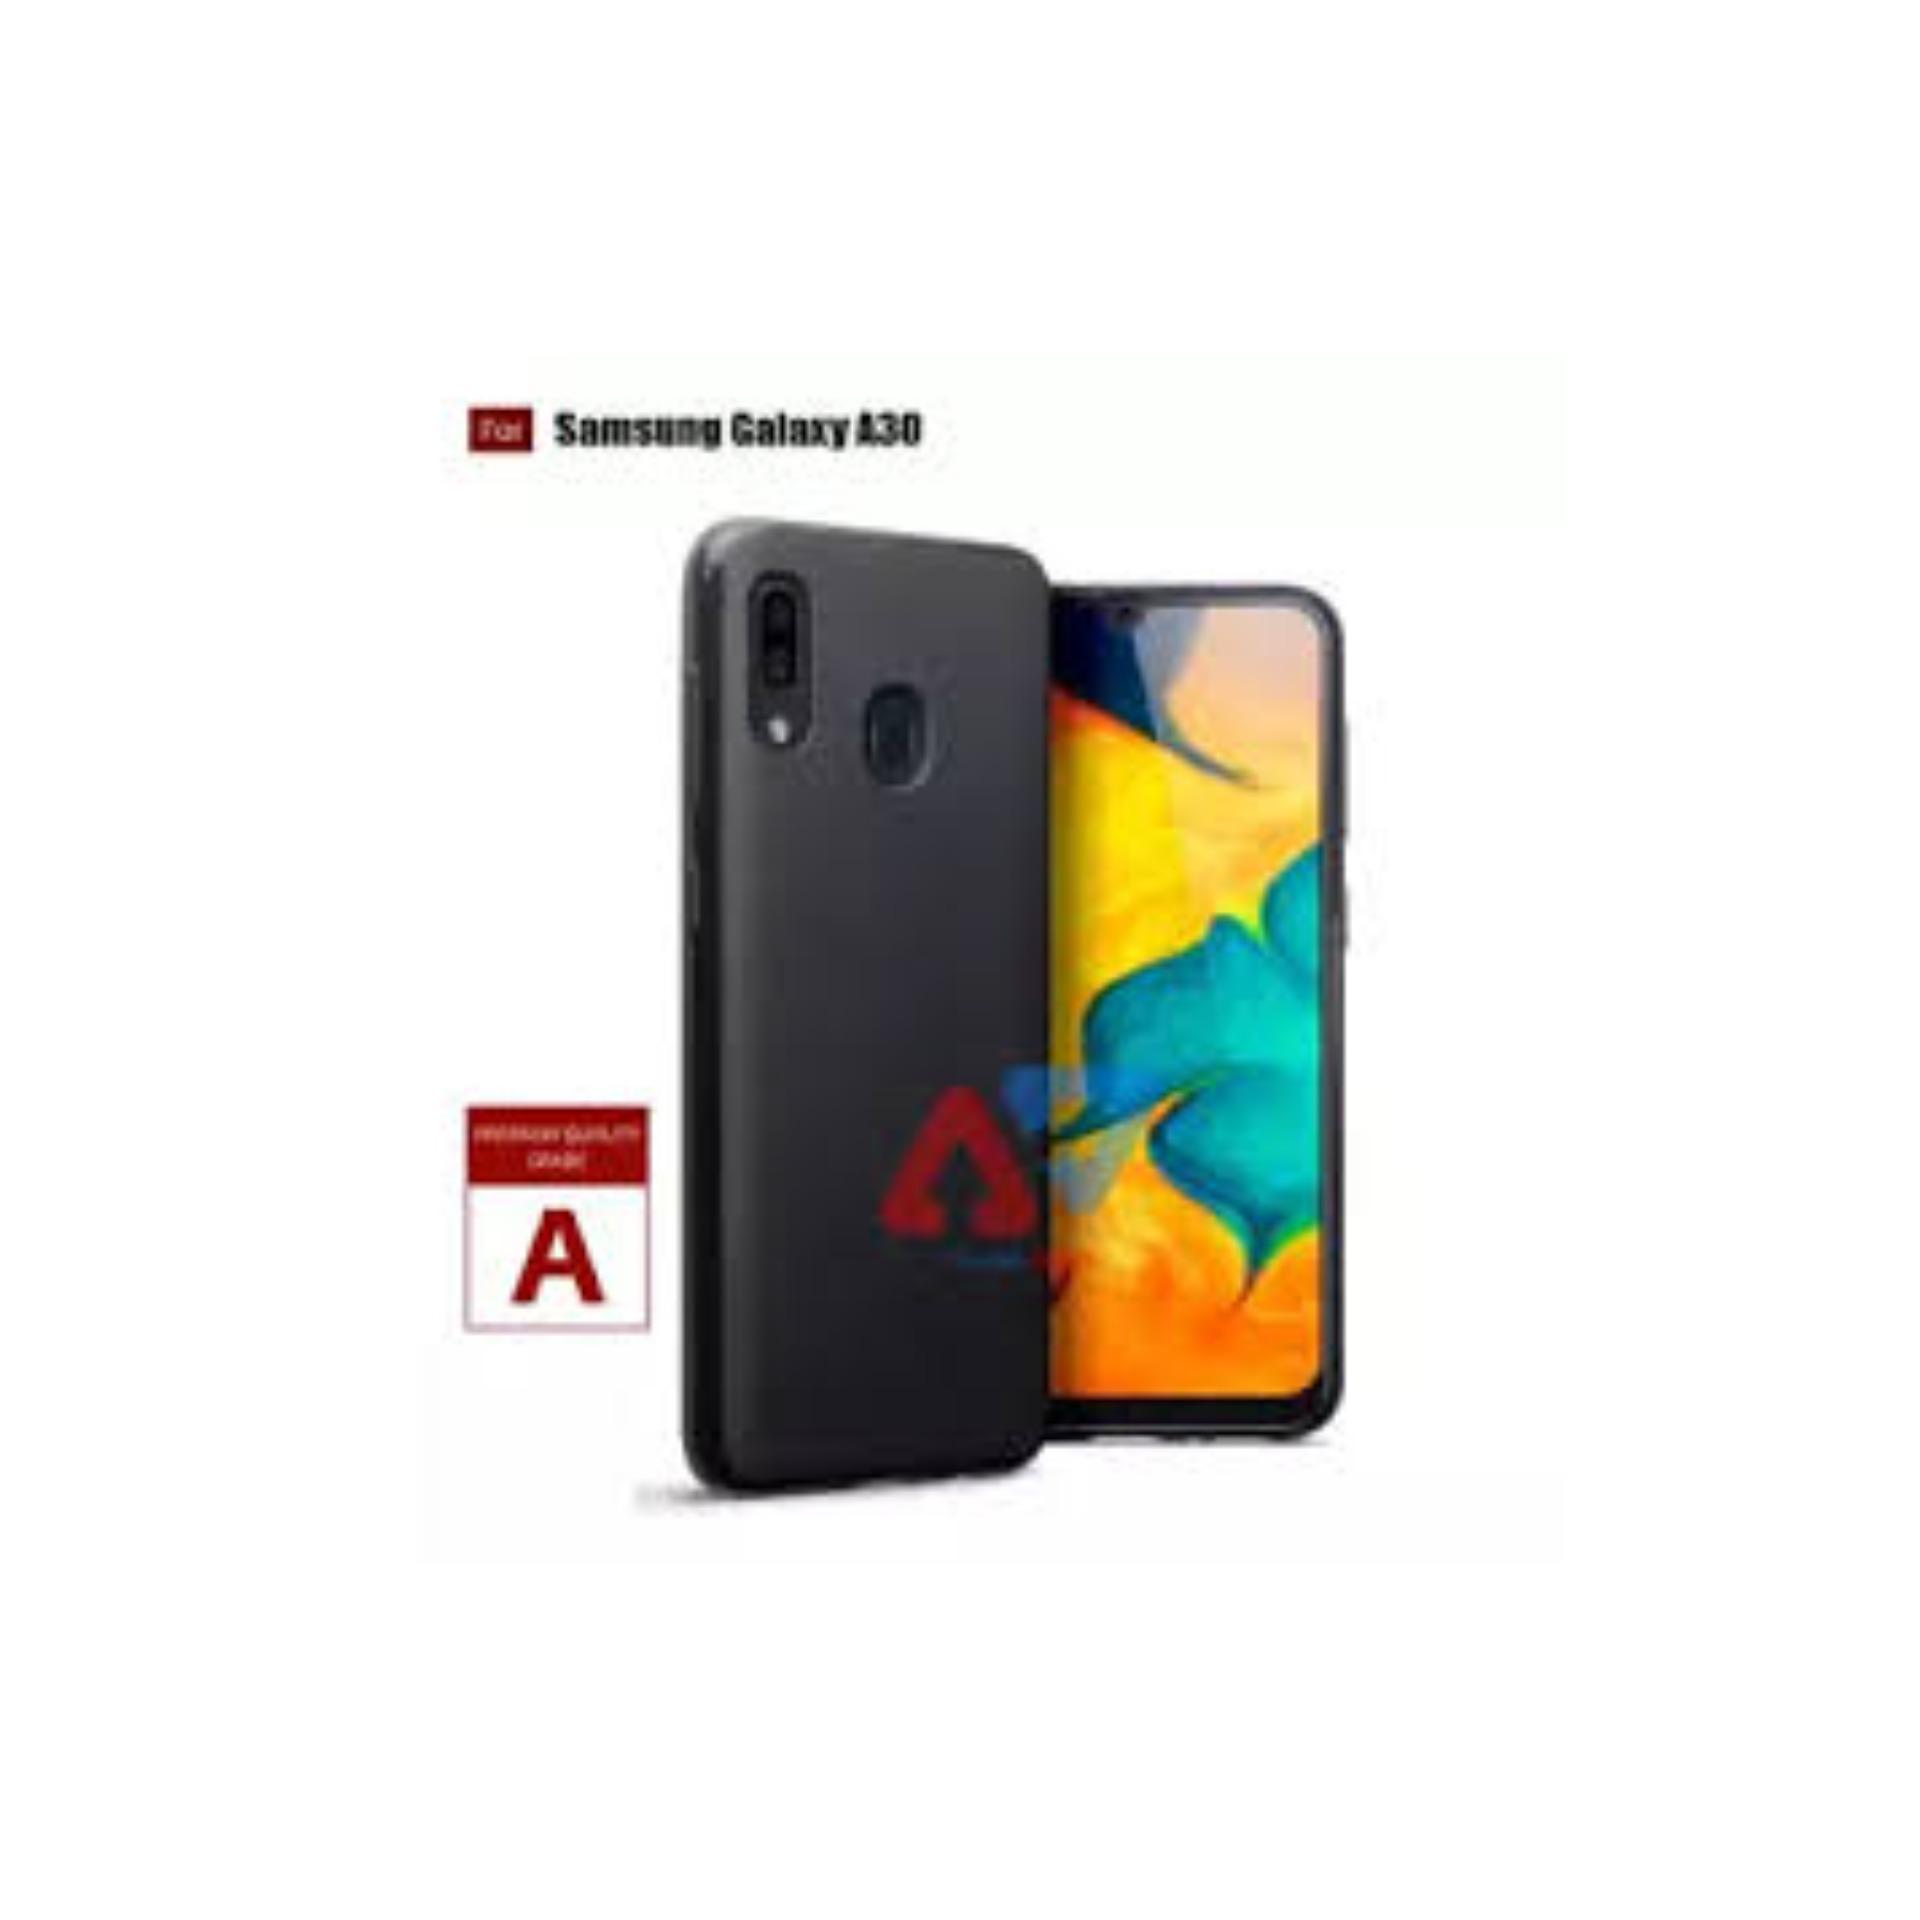 ULYBAE UltraSlim Black Matte Hybrid Case for Samsung Galaxy A30  - Black -  JUAL CASE MATTE Termurah - Terlaris Jakarta